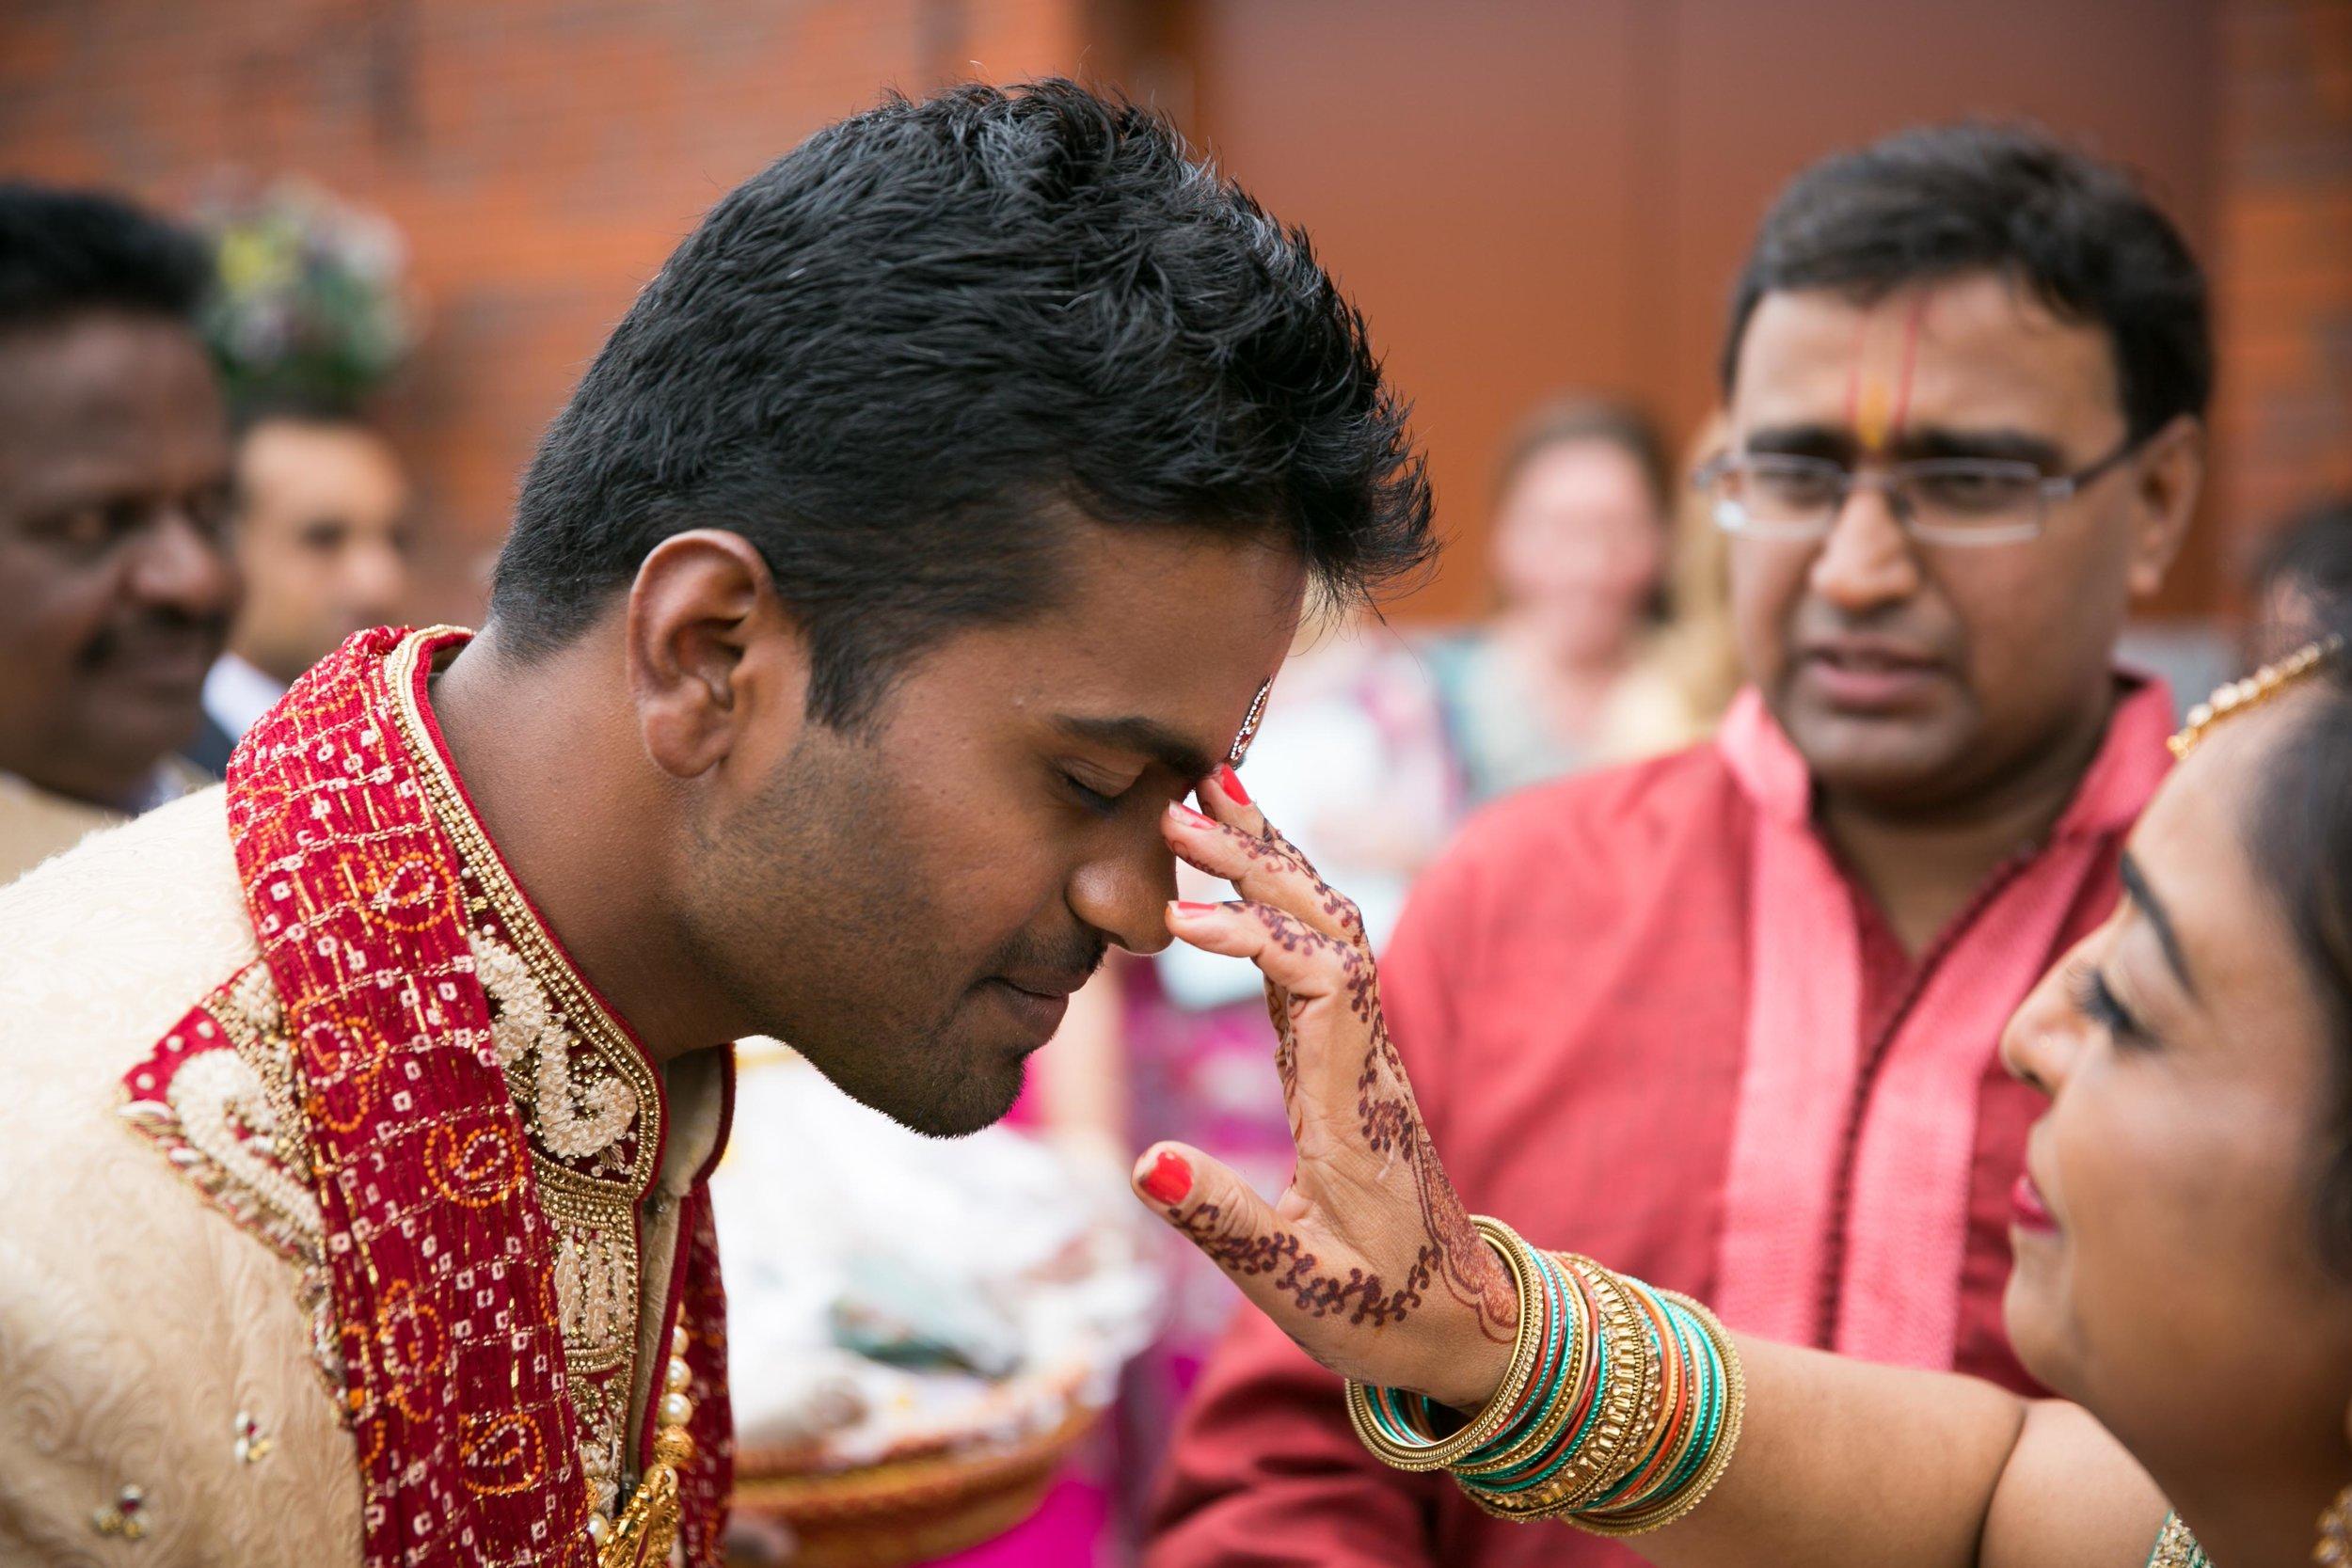 premier-banquetting-london-Hindu-asian-wedding-photographer-natalia-smith-photography-6.jpg